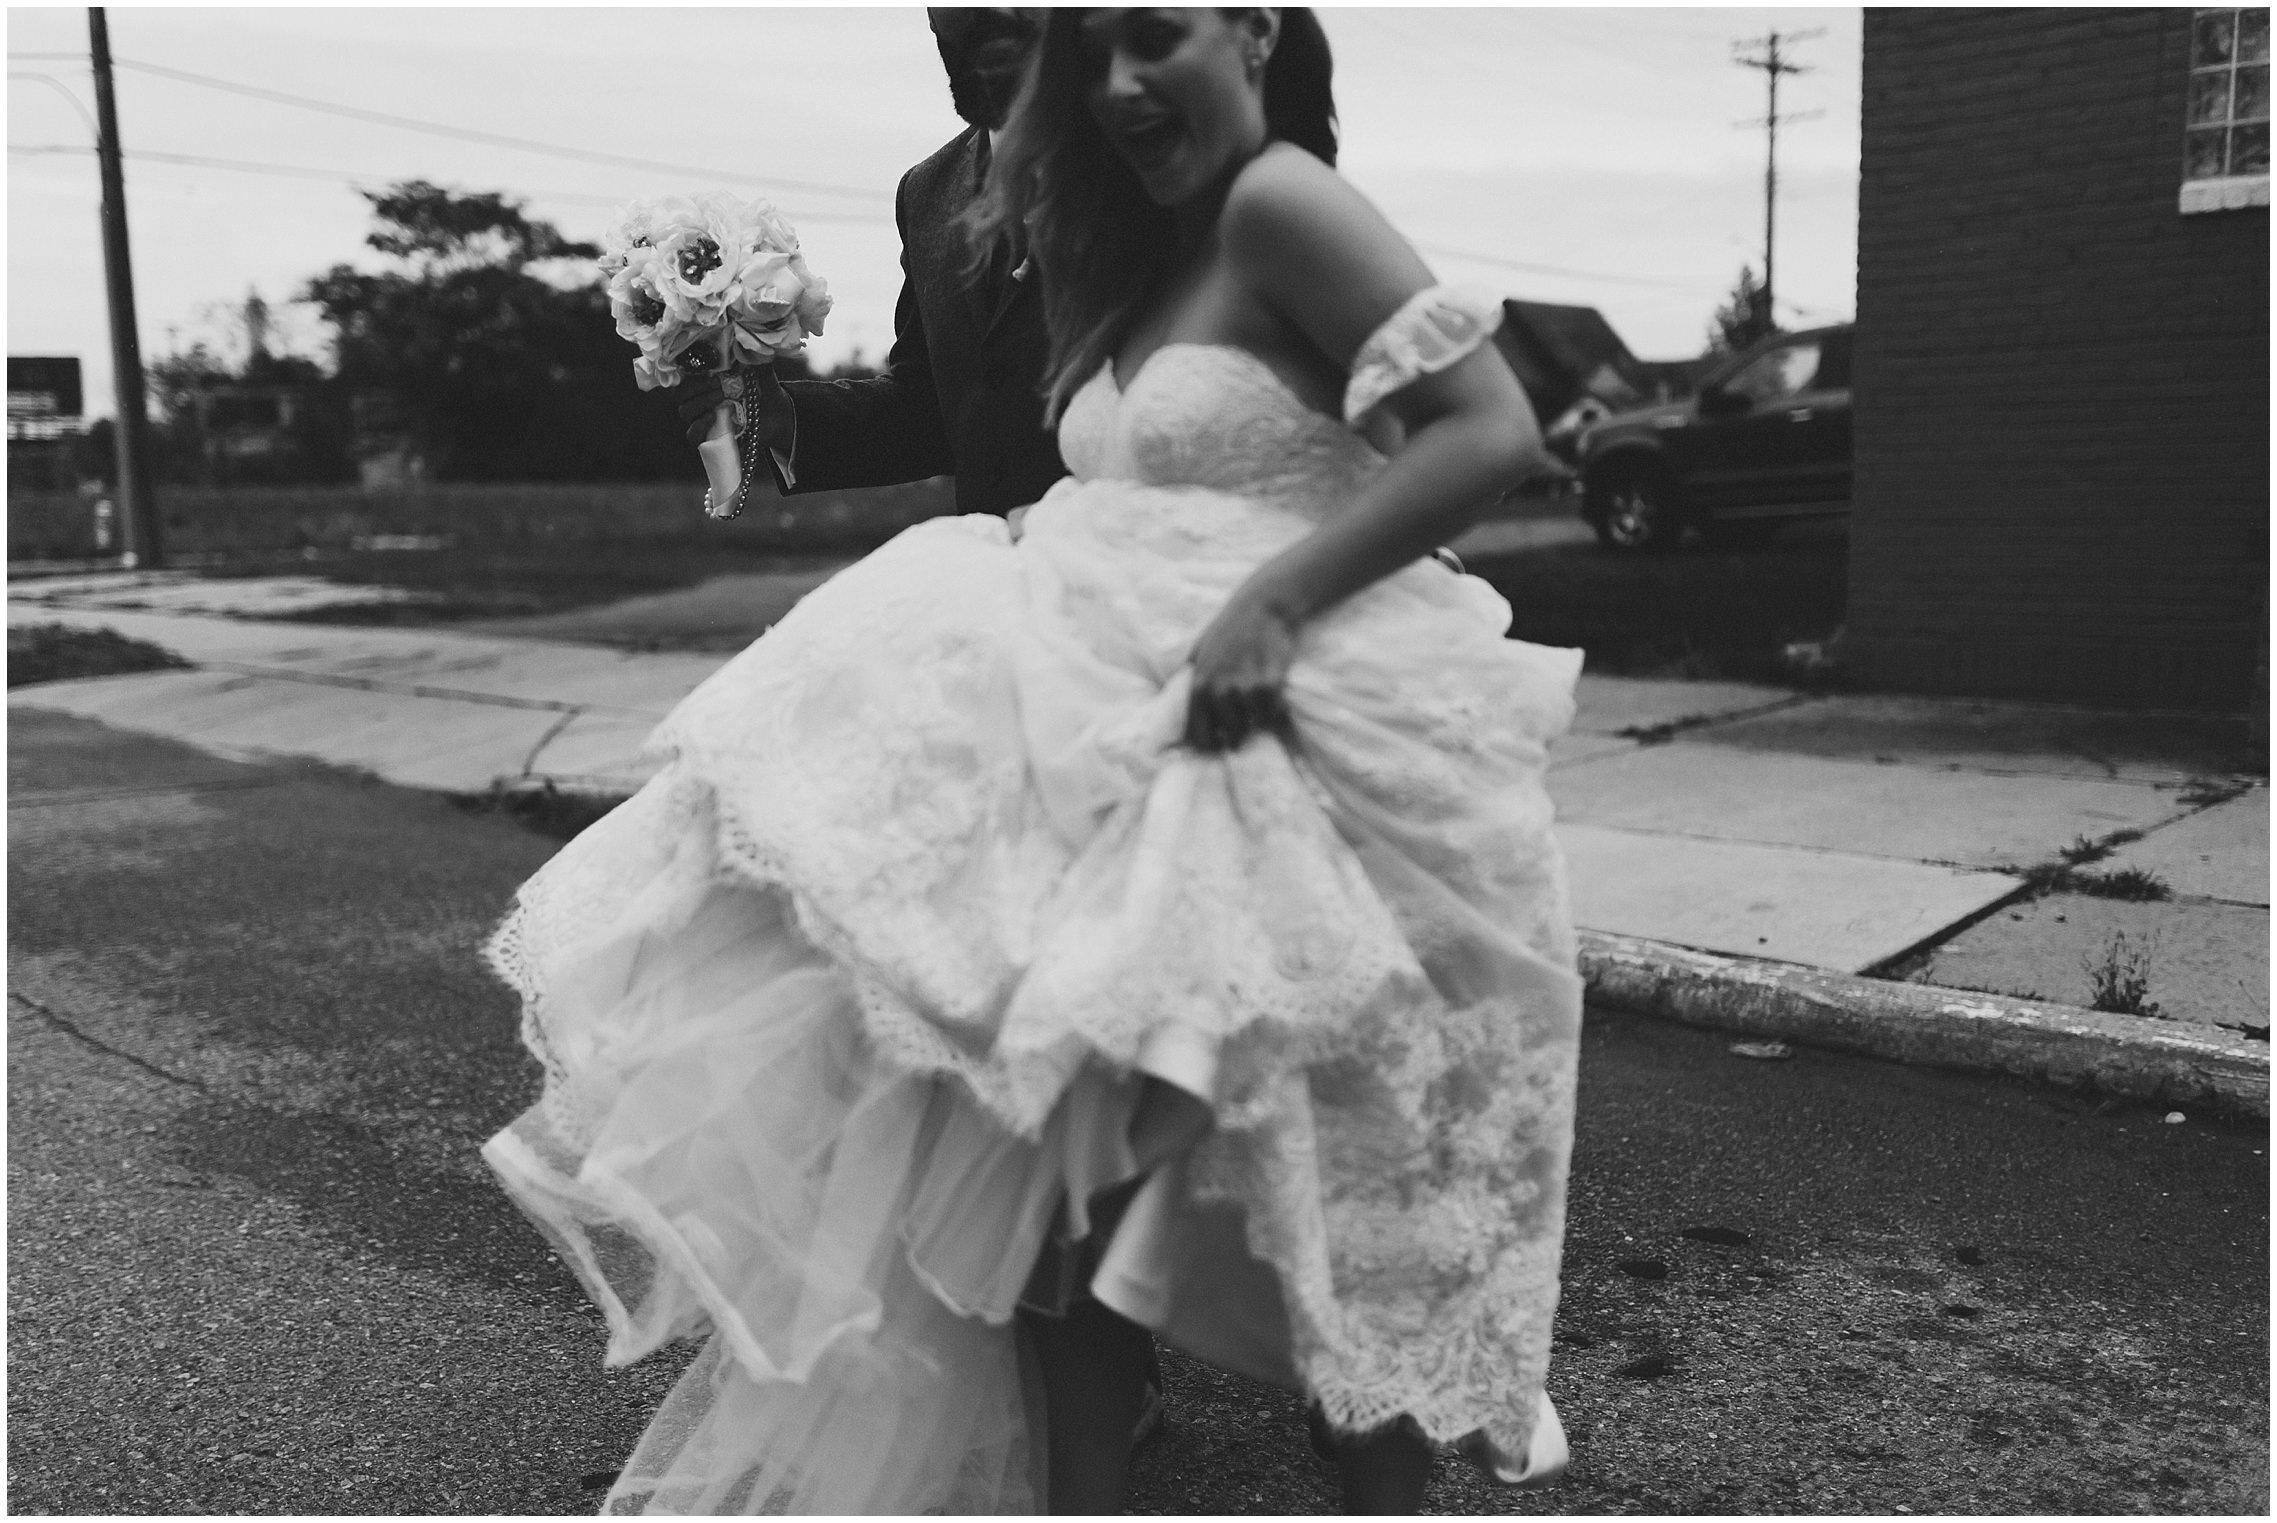 brick_and_mortar_colorado_wedding_photographer_0271.jpg